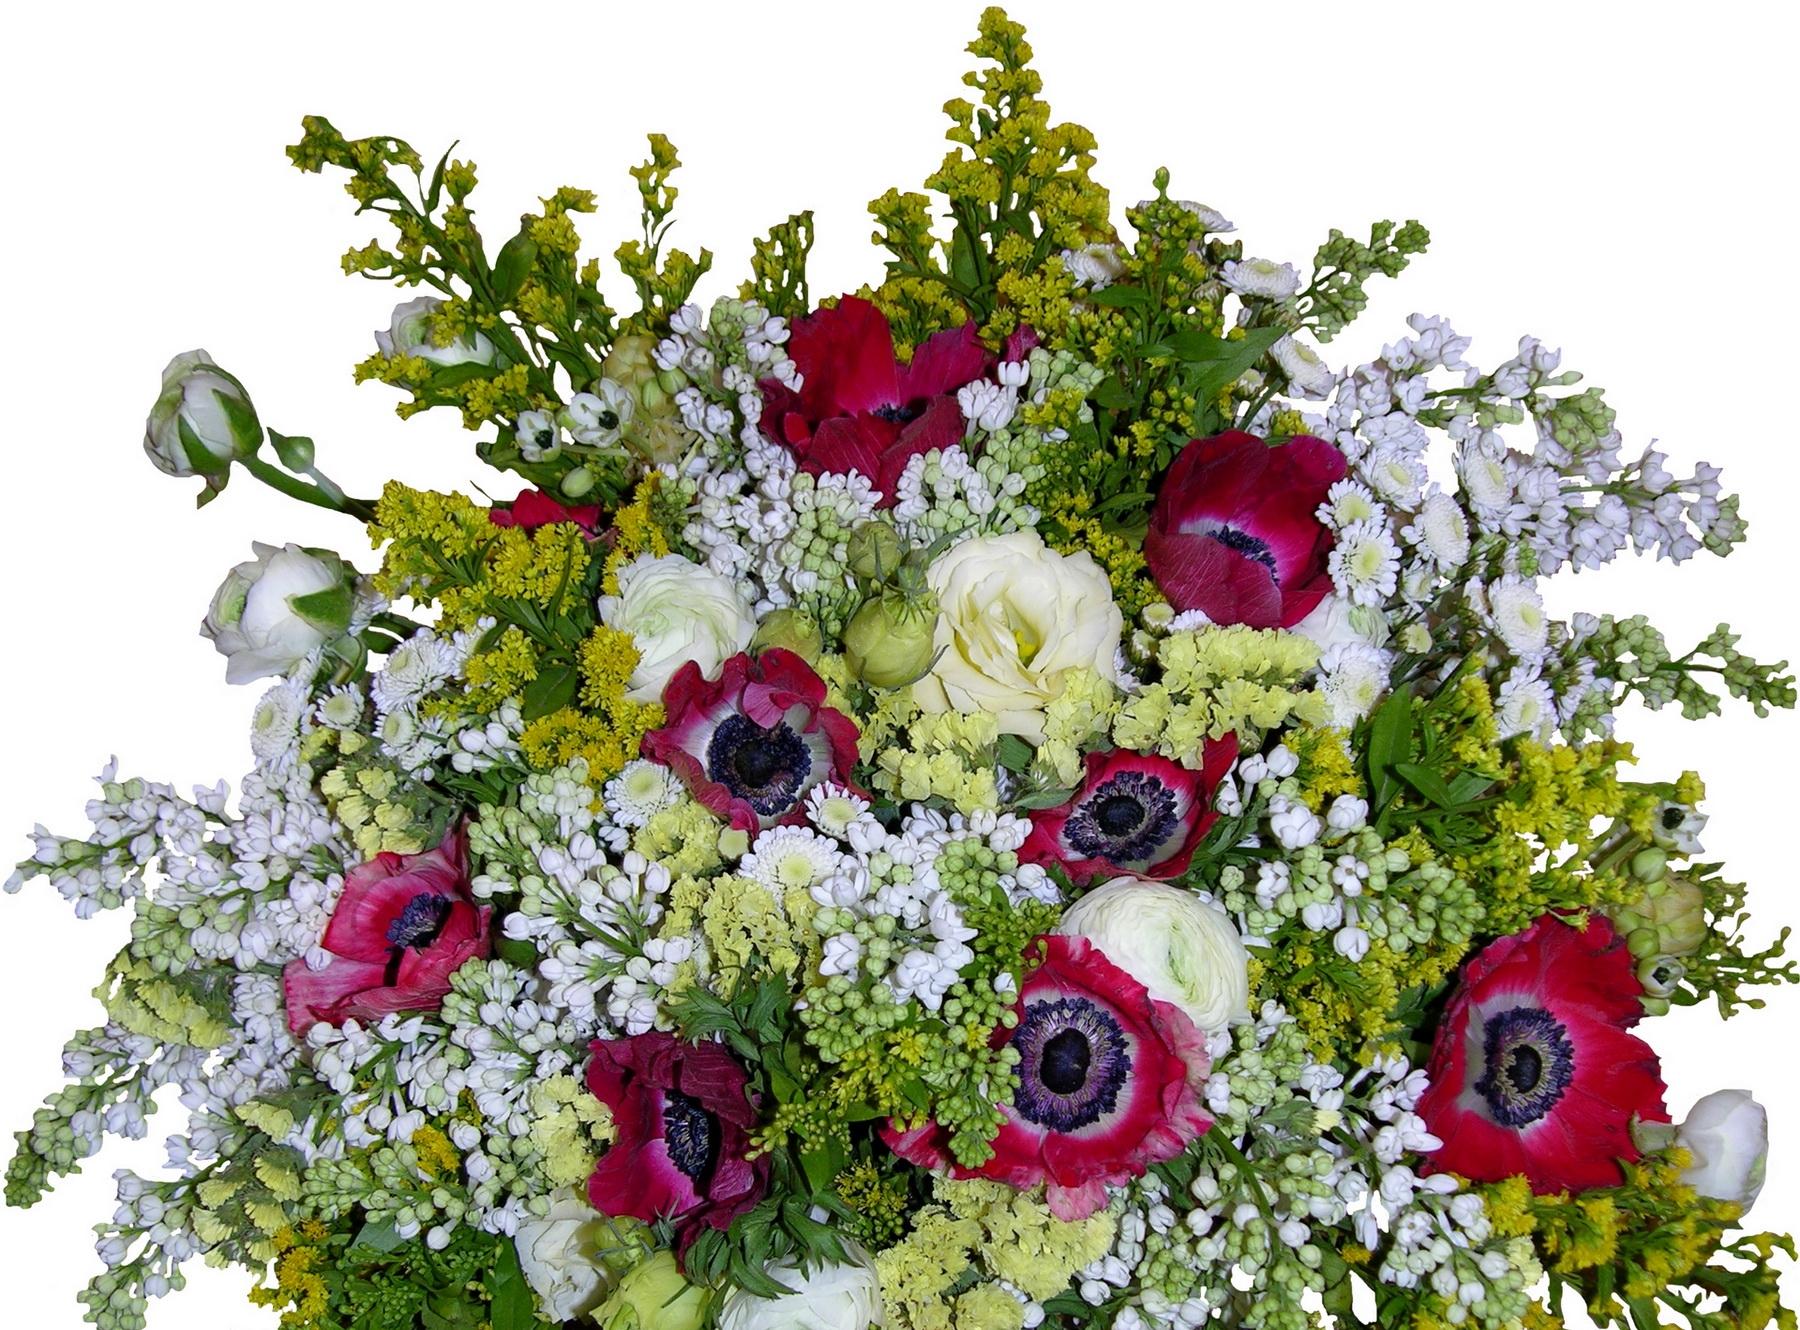 Wallpaper roses flowers bouquet big beautiful 1800x1330 roses flowers bouquet big beautiful izmirmasajfo